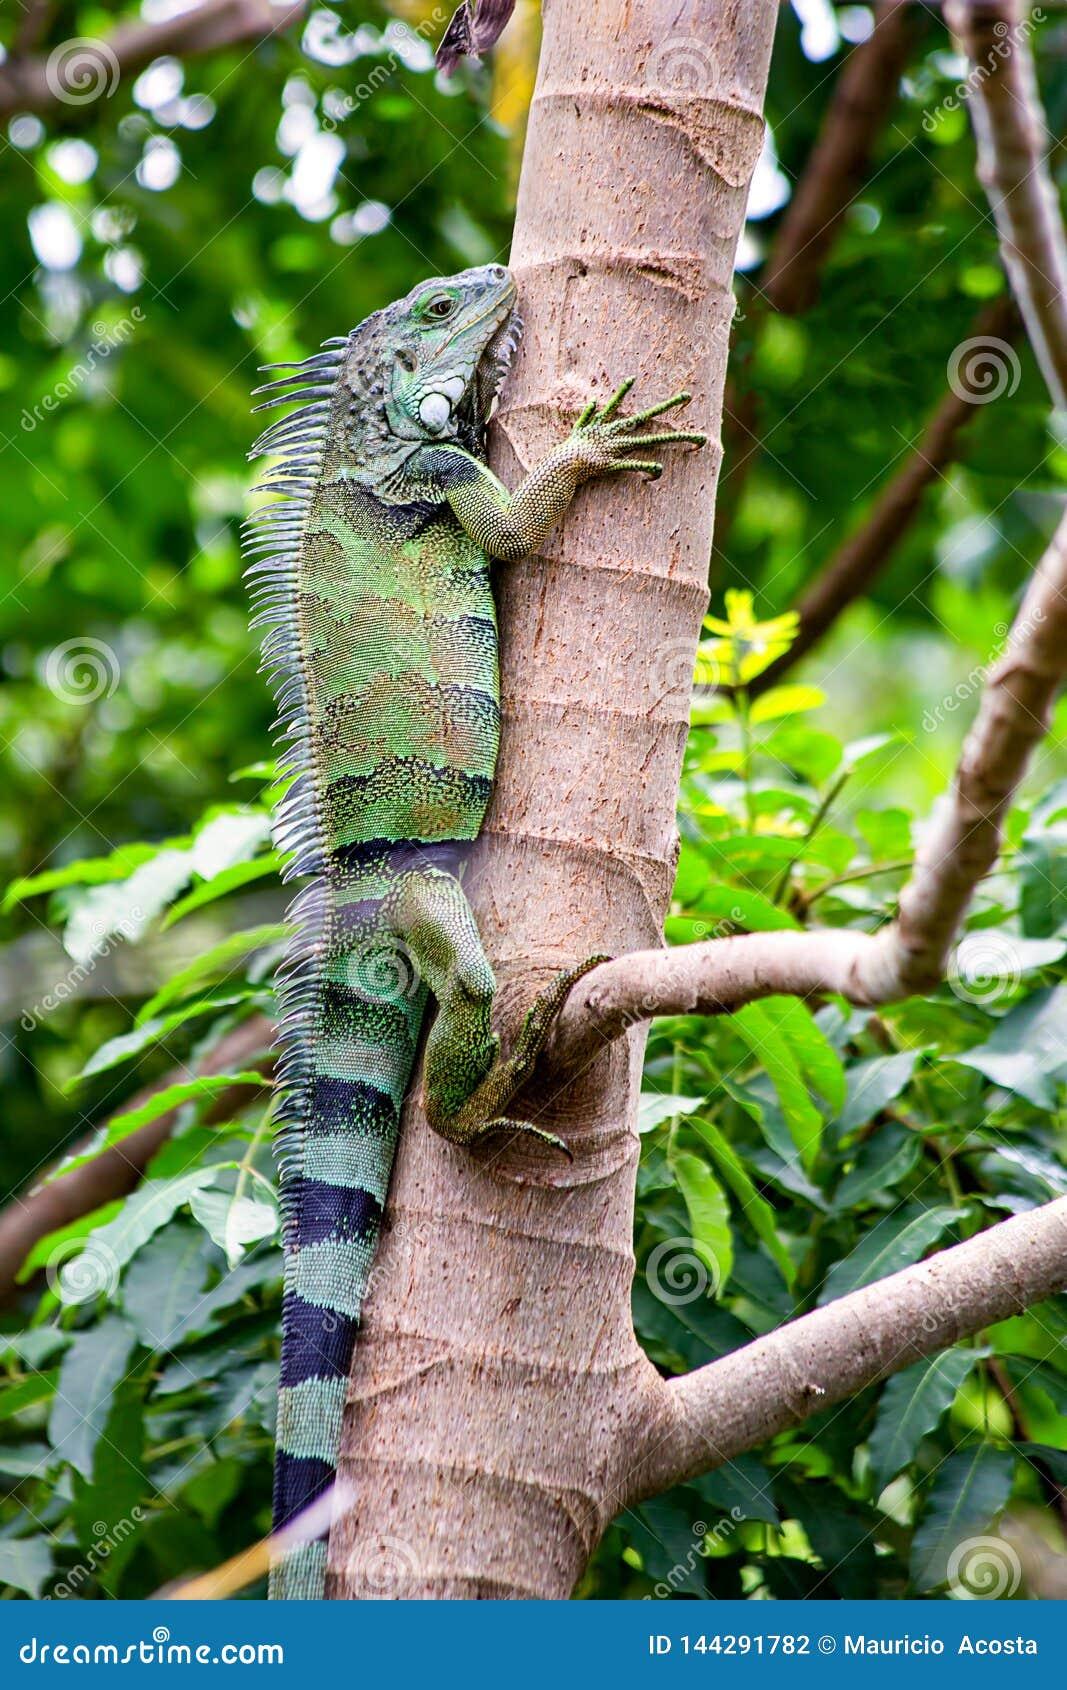 Grüner Leguan, der einen Baum klettert